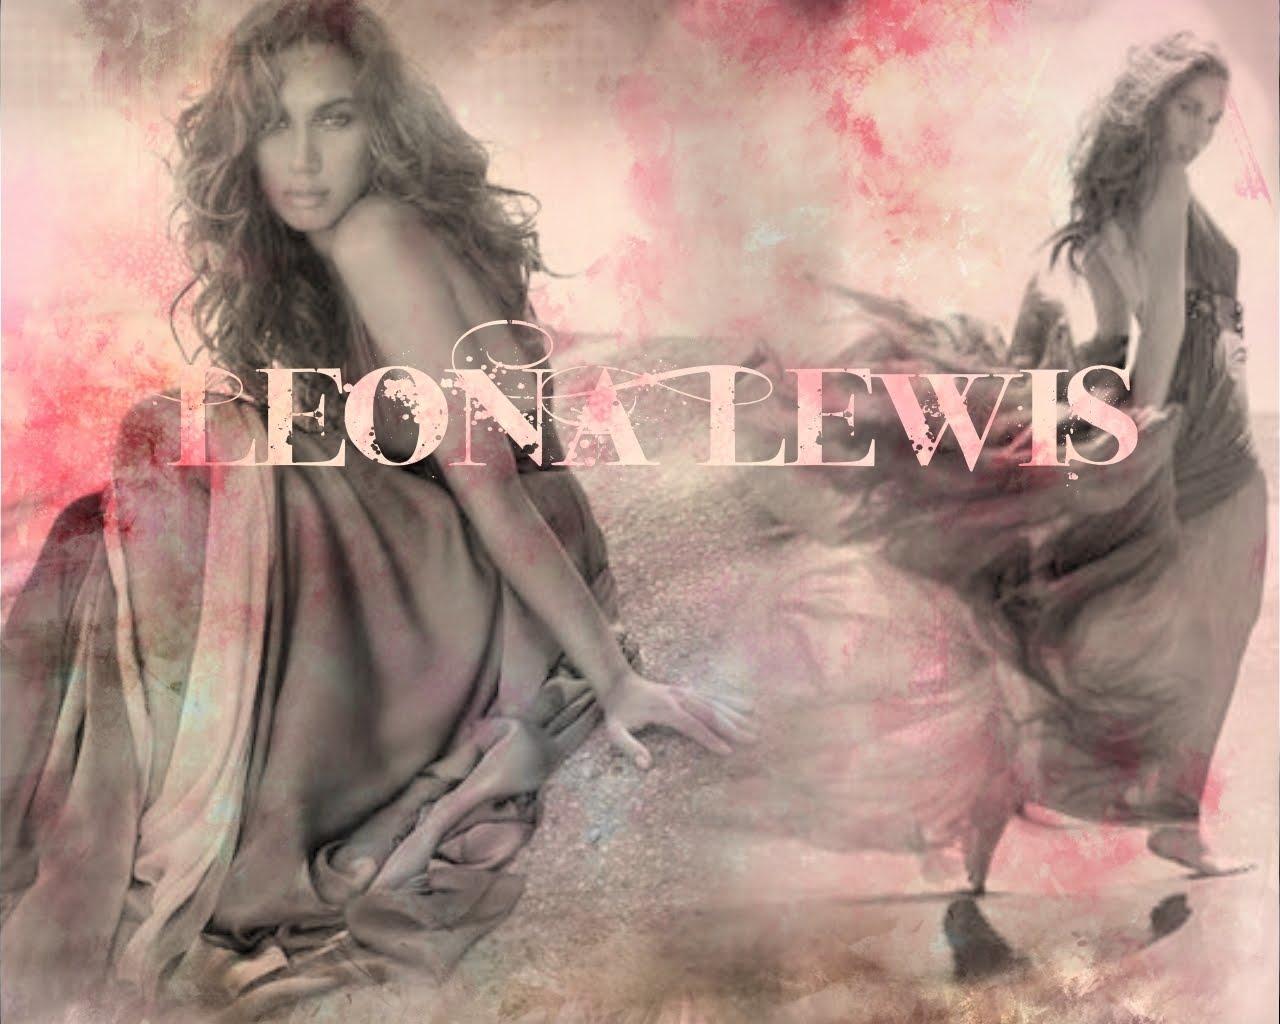 http://2.bp.blogspot.com/_ZRj5nlc3sp8/S9rooSZ04eI/AAAAAAAACBU/oWo3FbZbglg/s1600/Leona+Lewis+Fantastic+wallpapers+8.jpg